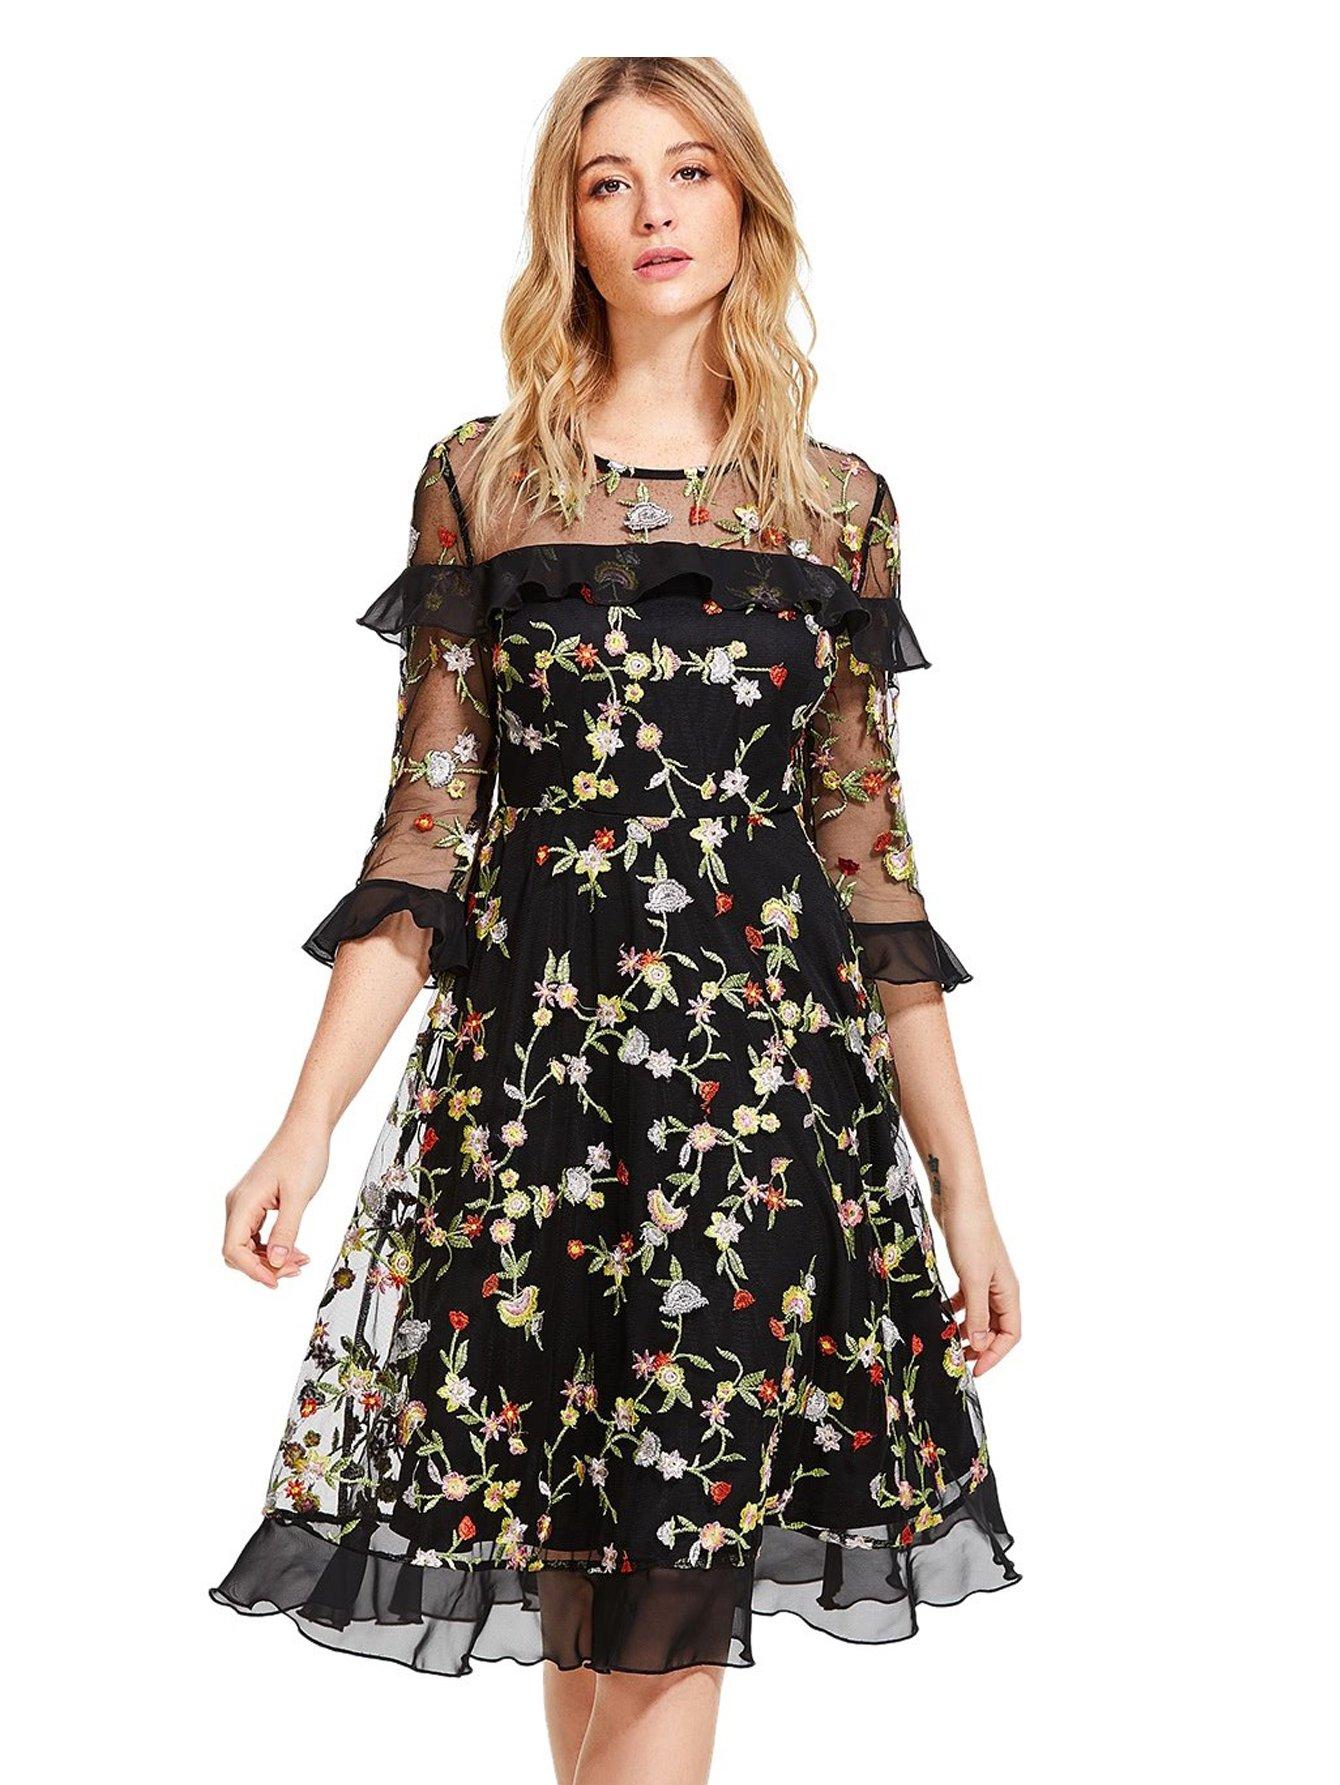 Verdusa Women's Floral Embroidered 3/4 Flounce Sleeve Dress